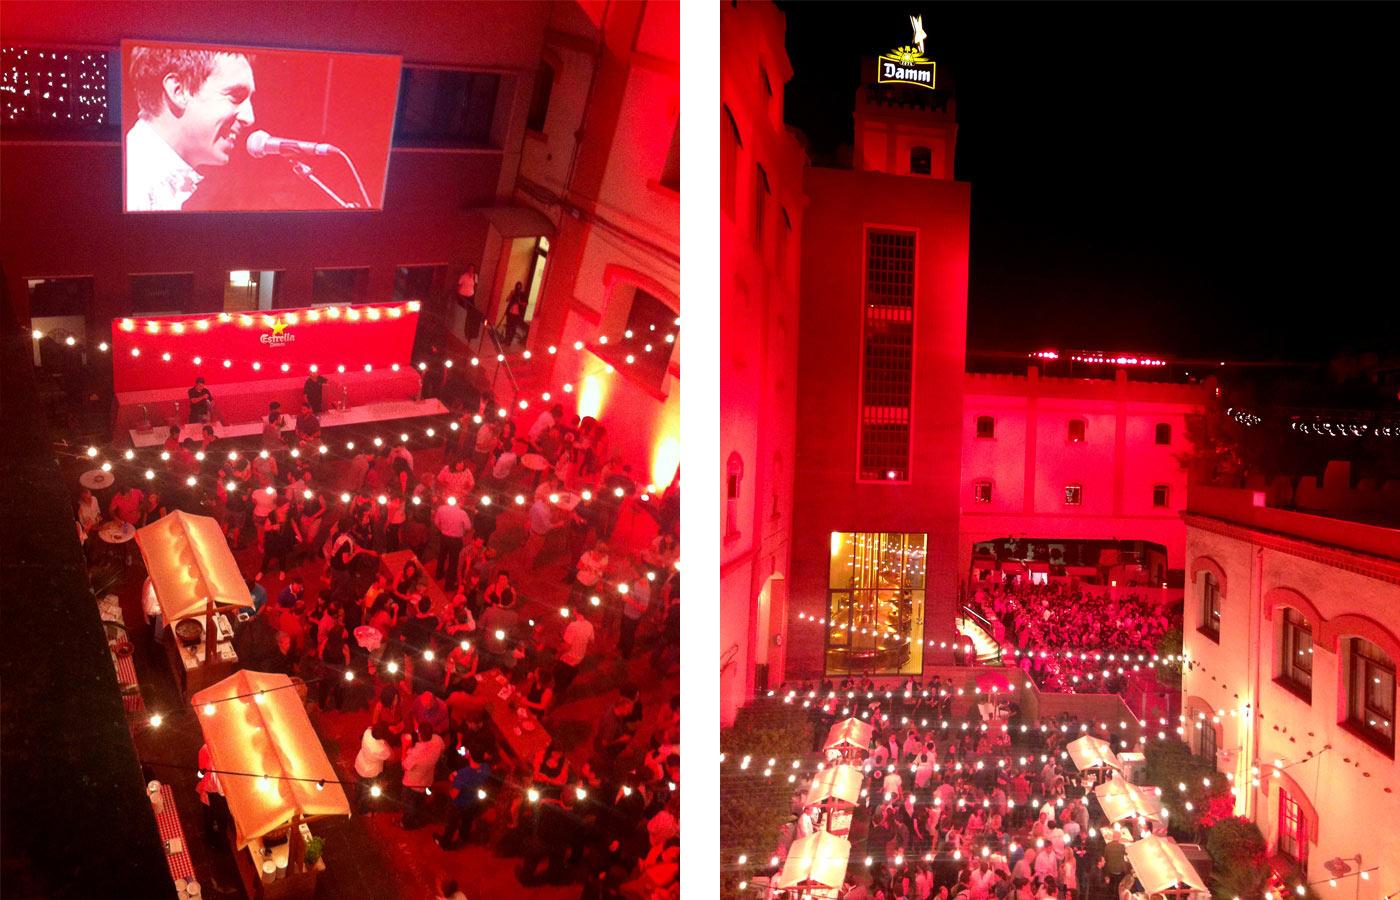 concert-miles-kane-sopar-damm-la-merce-festa-major-disseny-espai